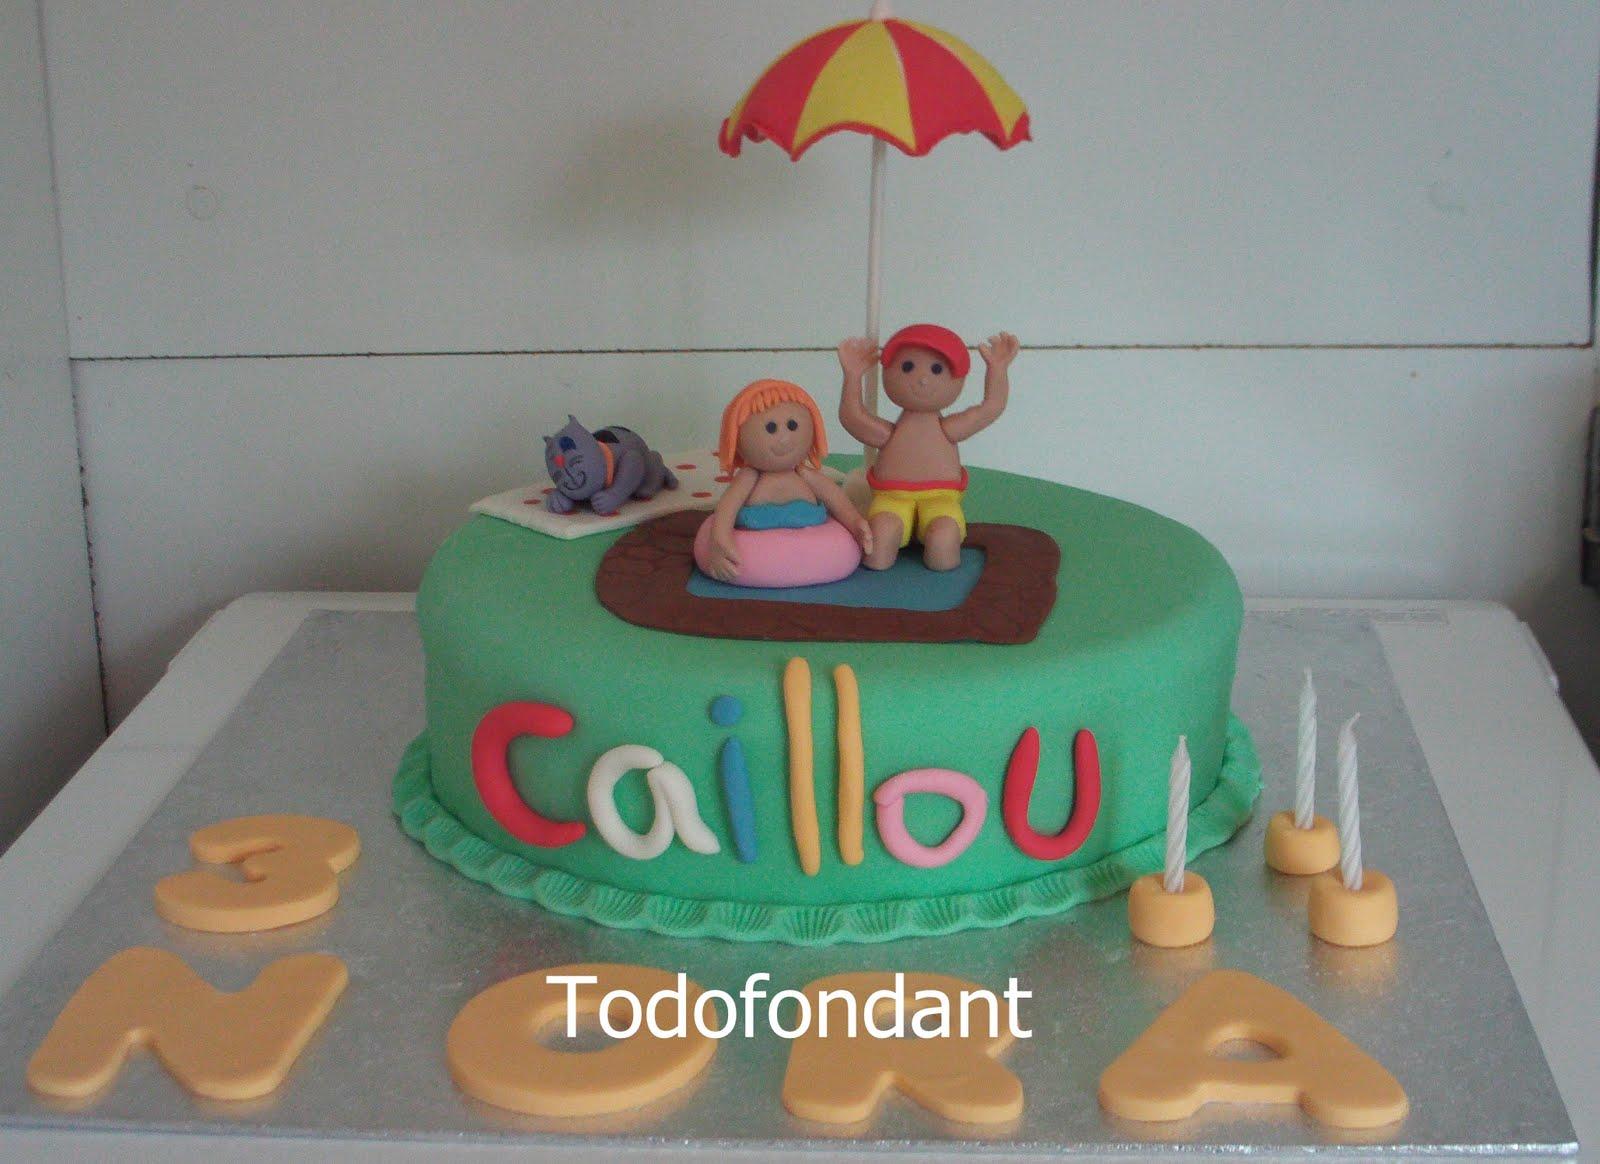 todofondant tarta caillou en la piscina decorada con fondant